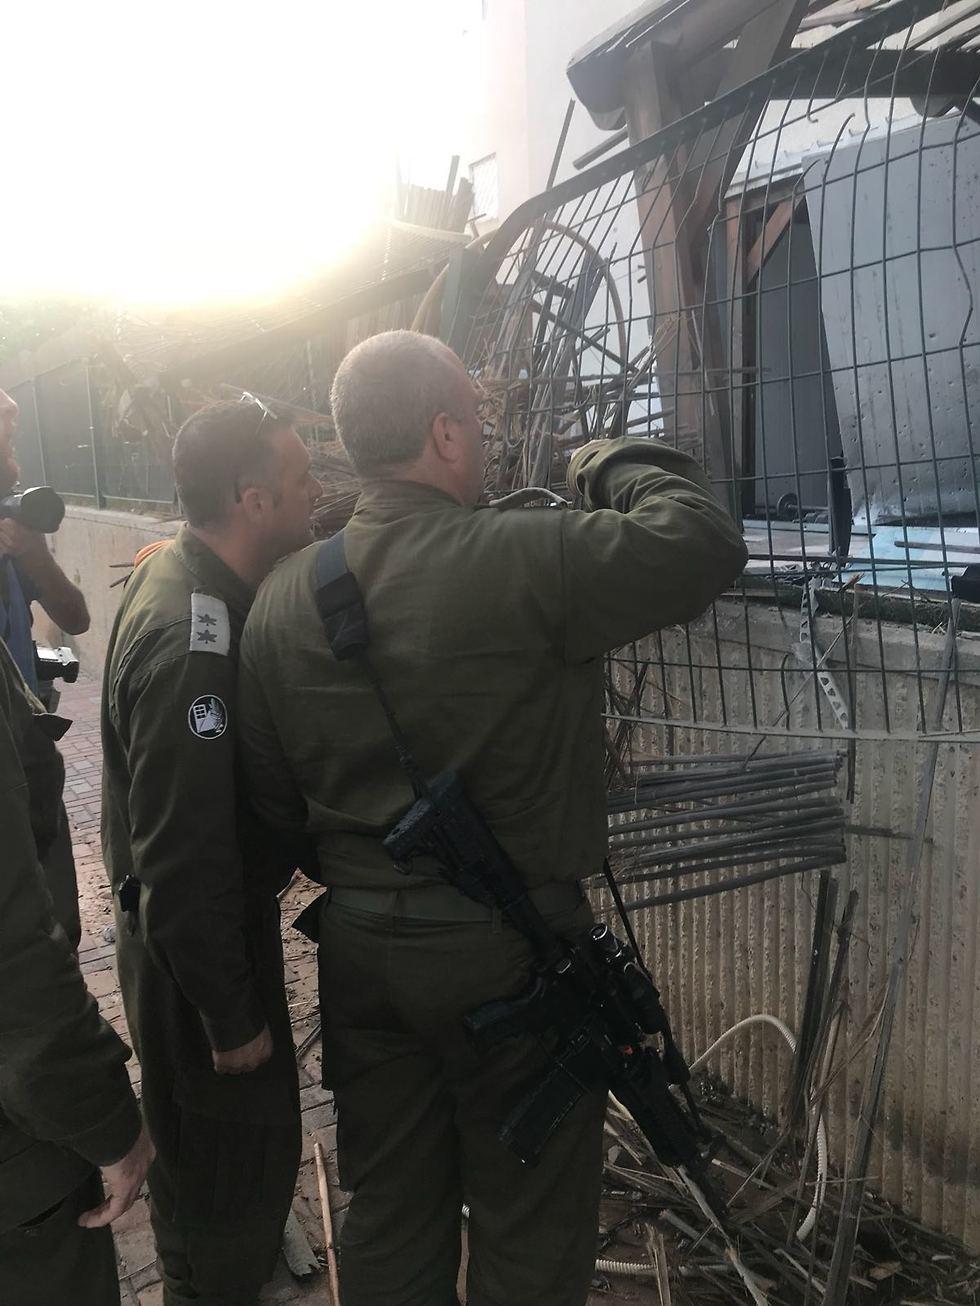 Gaza Division Commander Yehuda Fuchs visits Sderot after rocket hit (Photo: IDF Spokesman's Office)